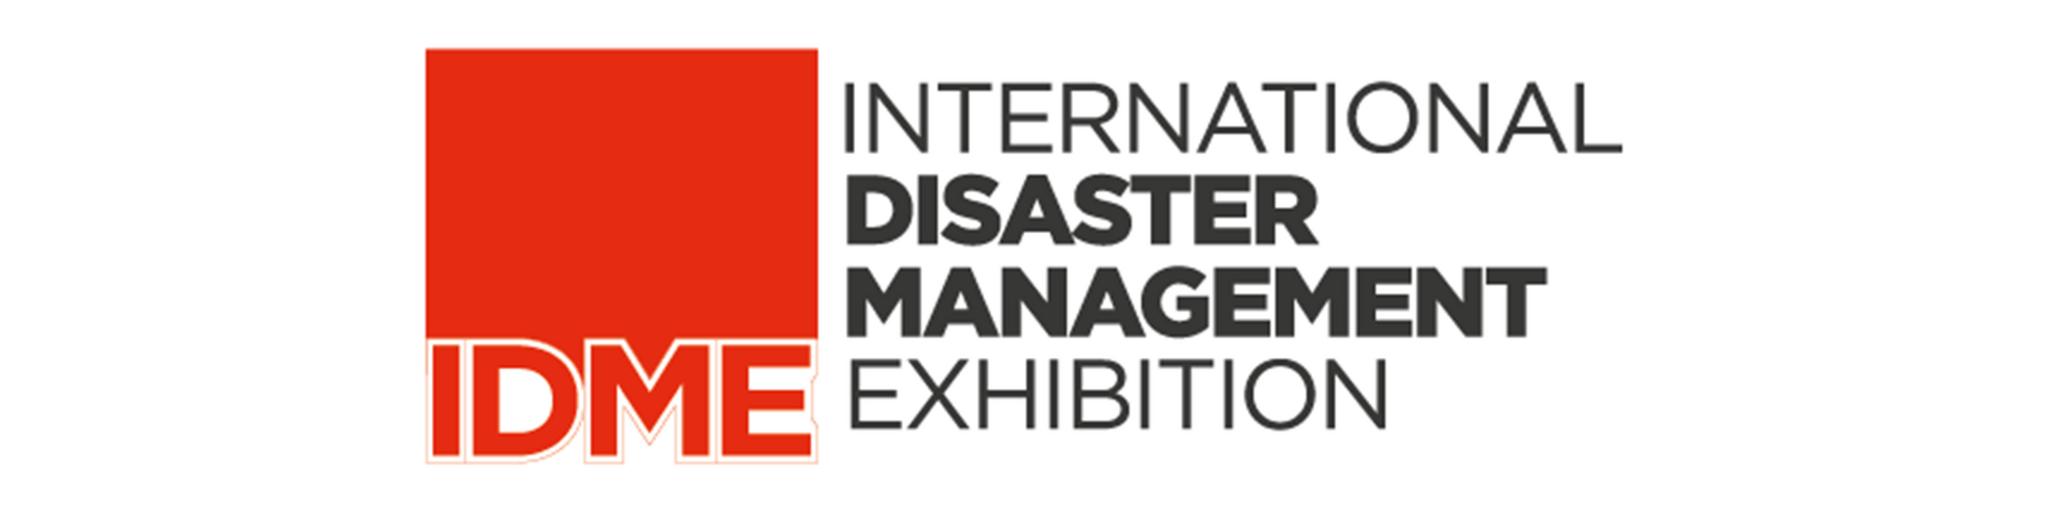 International Disaster Management Exhibition